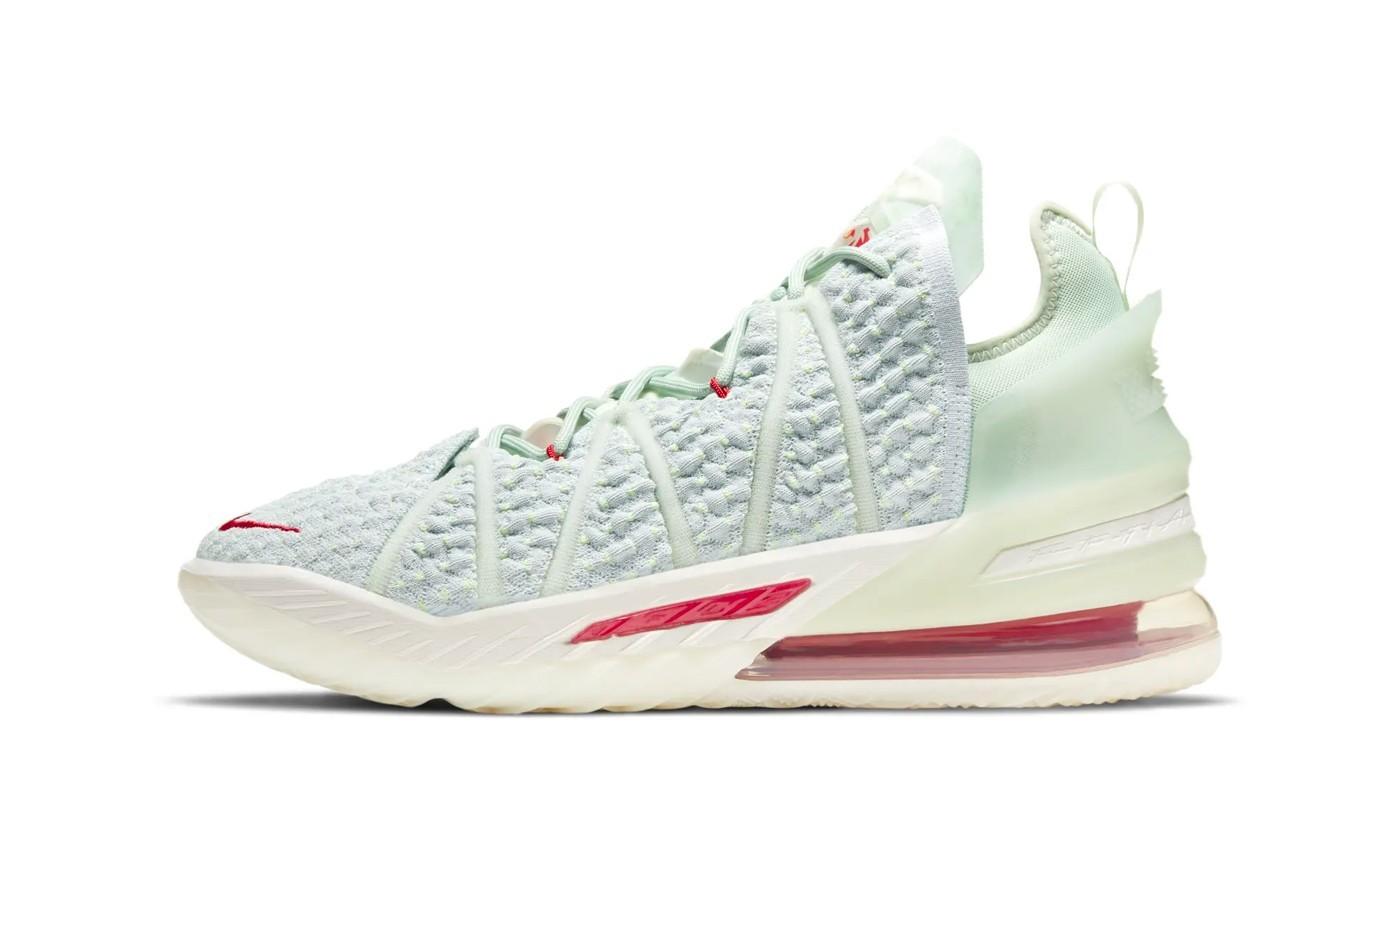 Nike LeBron 18 EP